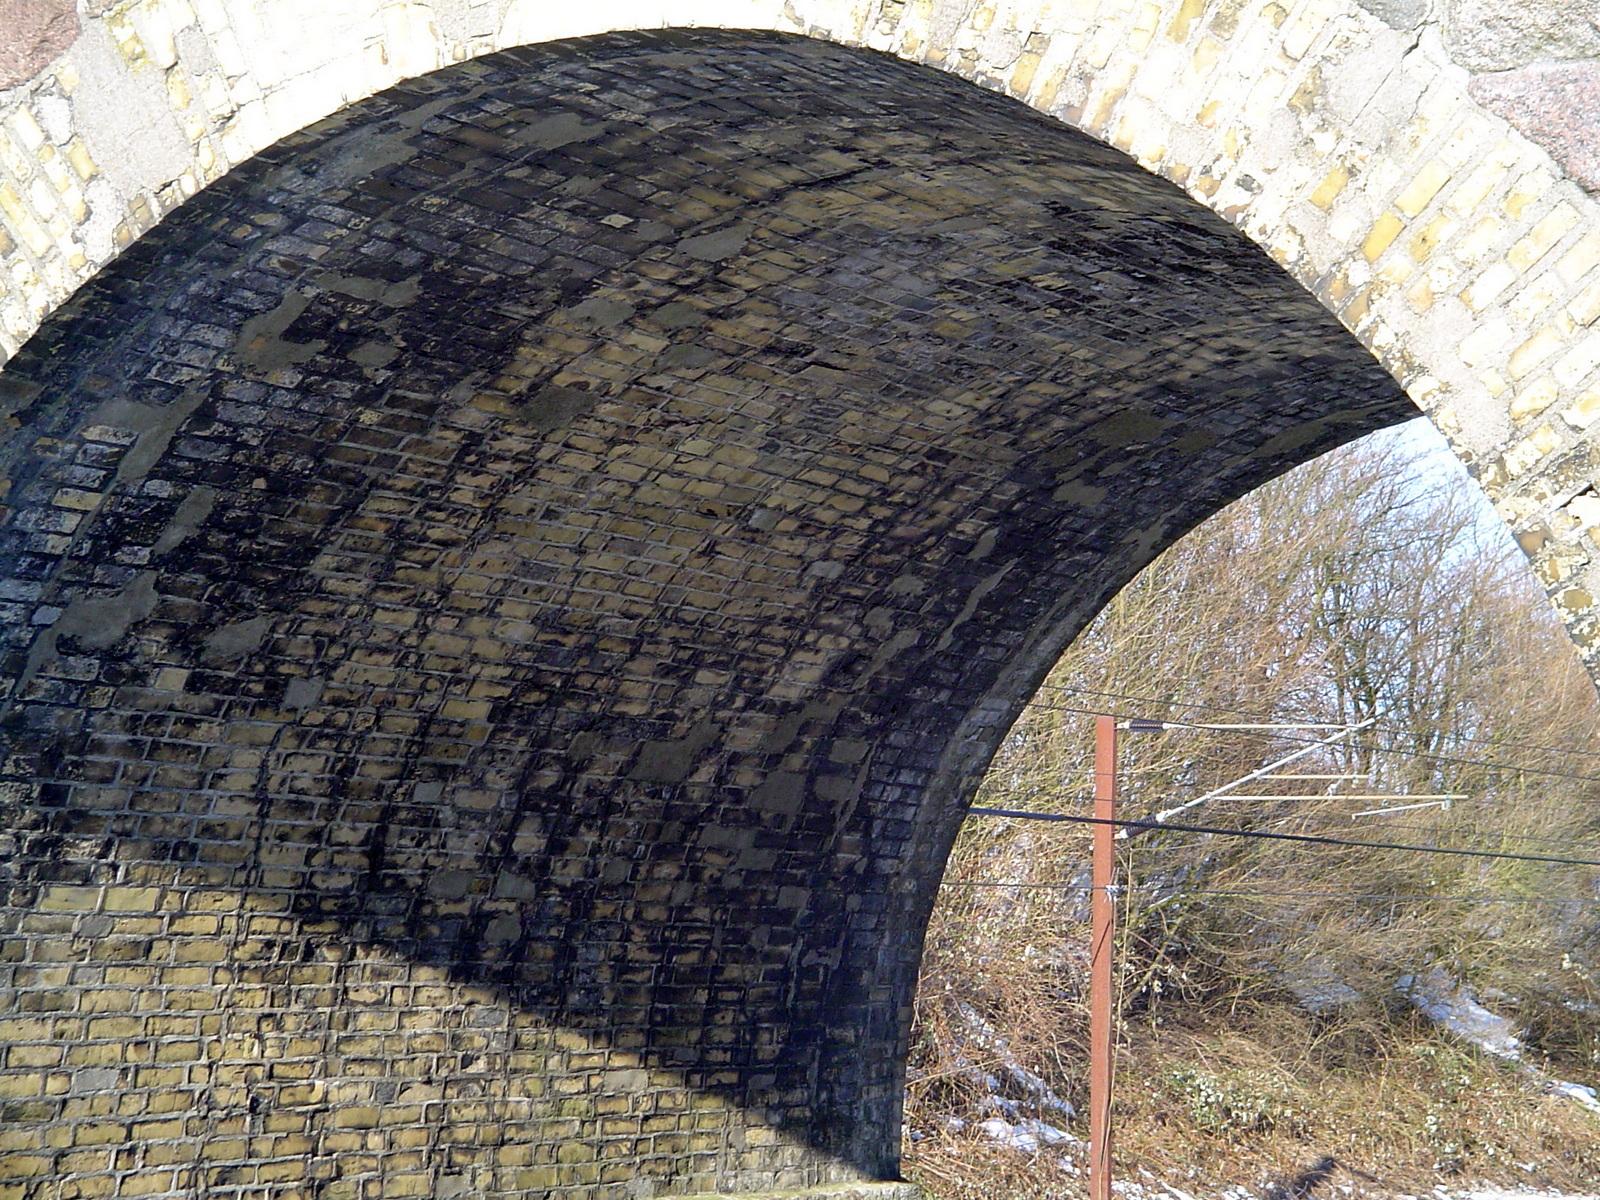 1800 tallets ingeniørkunst i mursten.